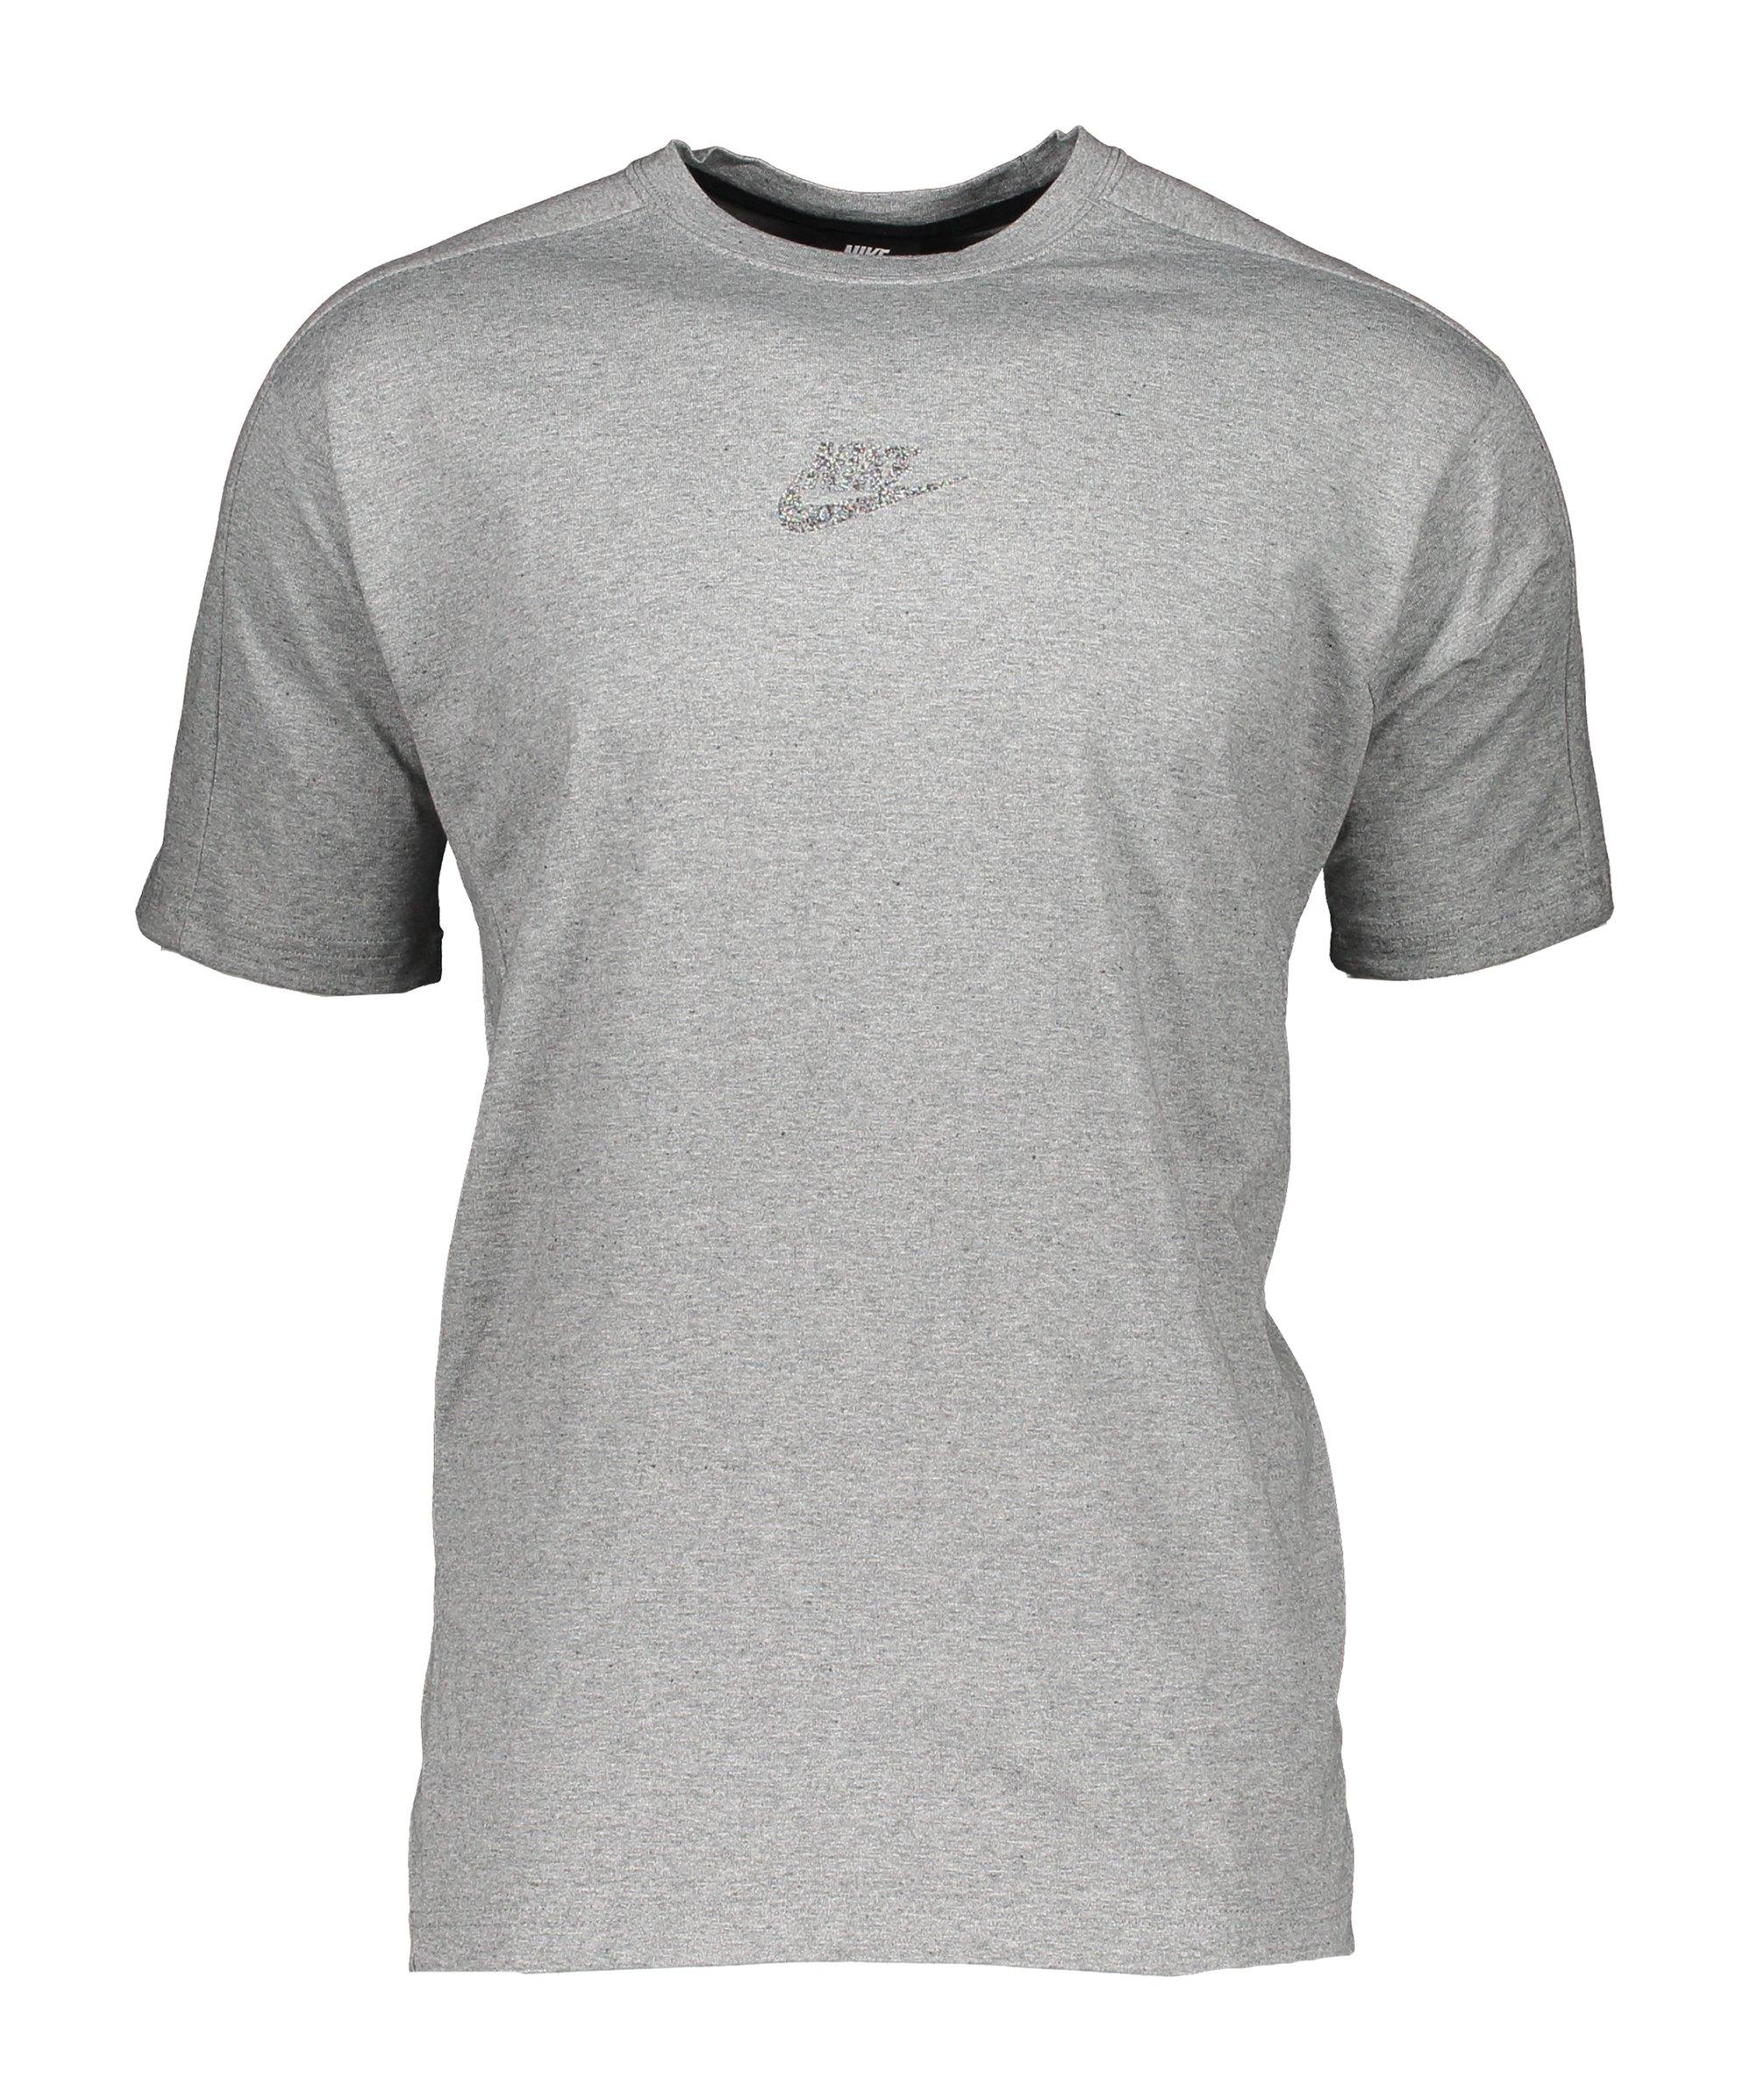 Nike Revival T-Shirt Schwarz Grau F010 - schwarz